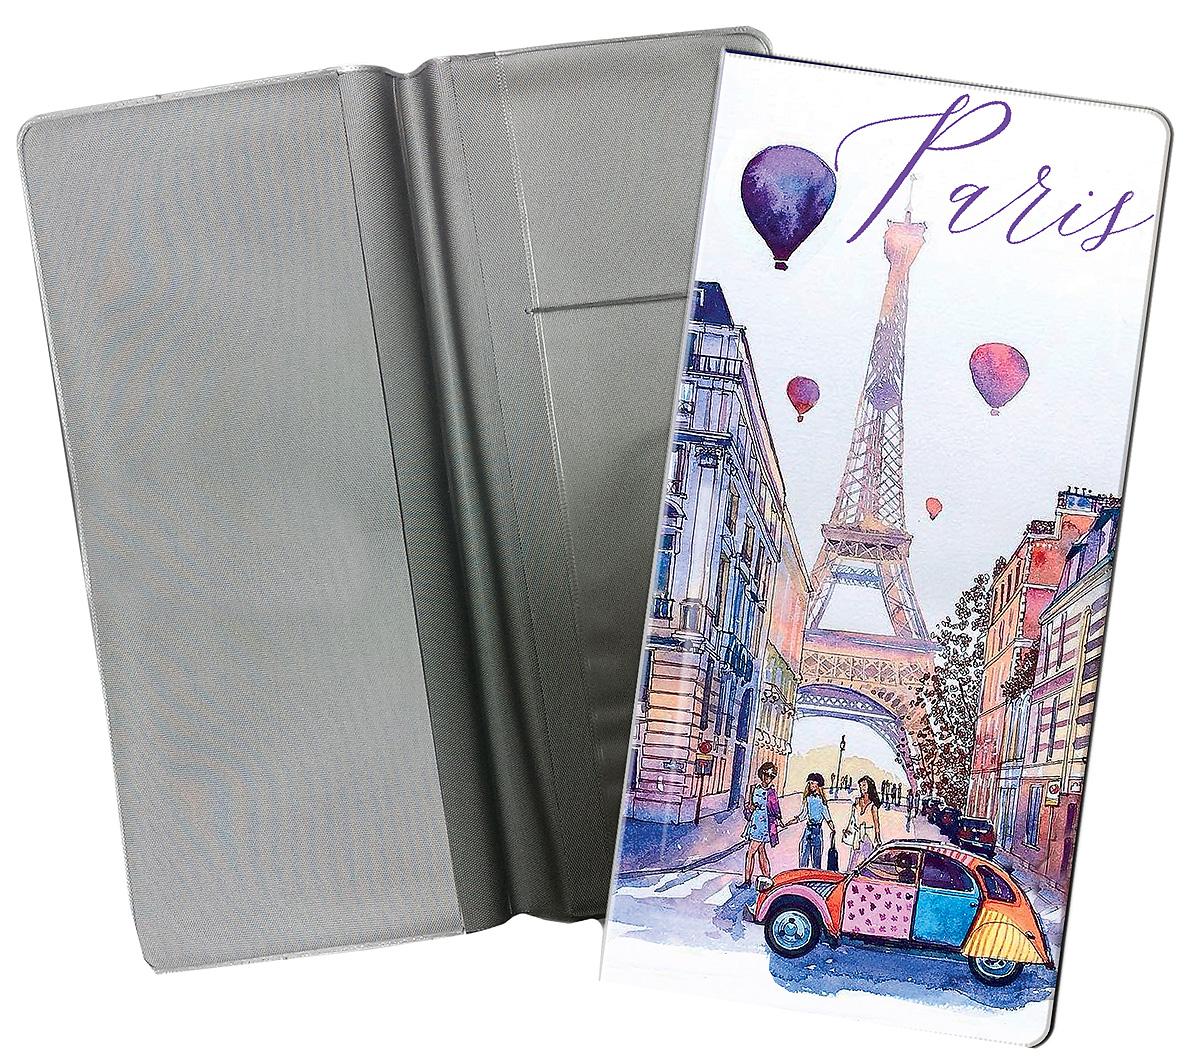 Конверт путешественника Magic Home Прогулка по Парижу, для документов. 77223 сувенир конверт путешественника авто винтаж для документов из пвх 20 5 22см 77224